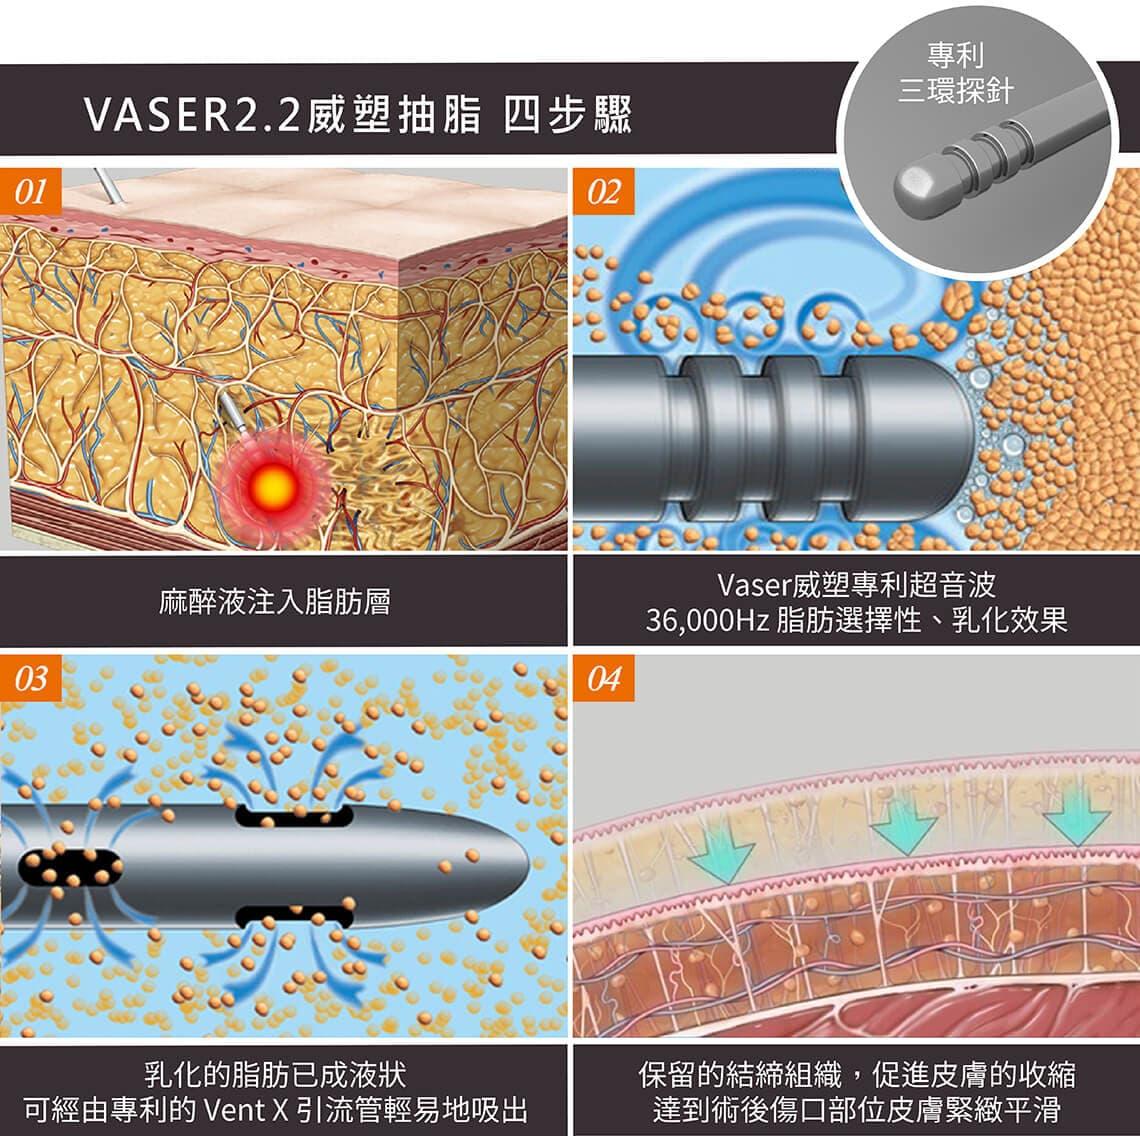 VASER2.2 二代威塑抽脂四步驟